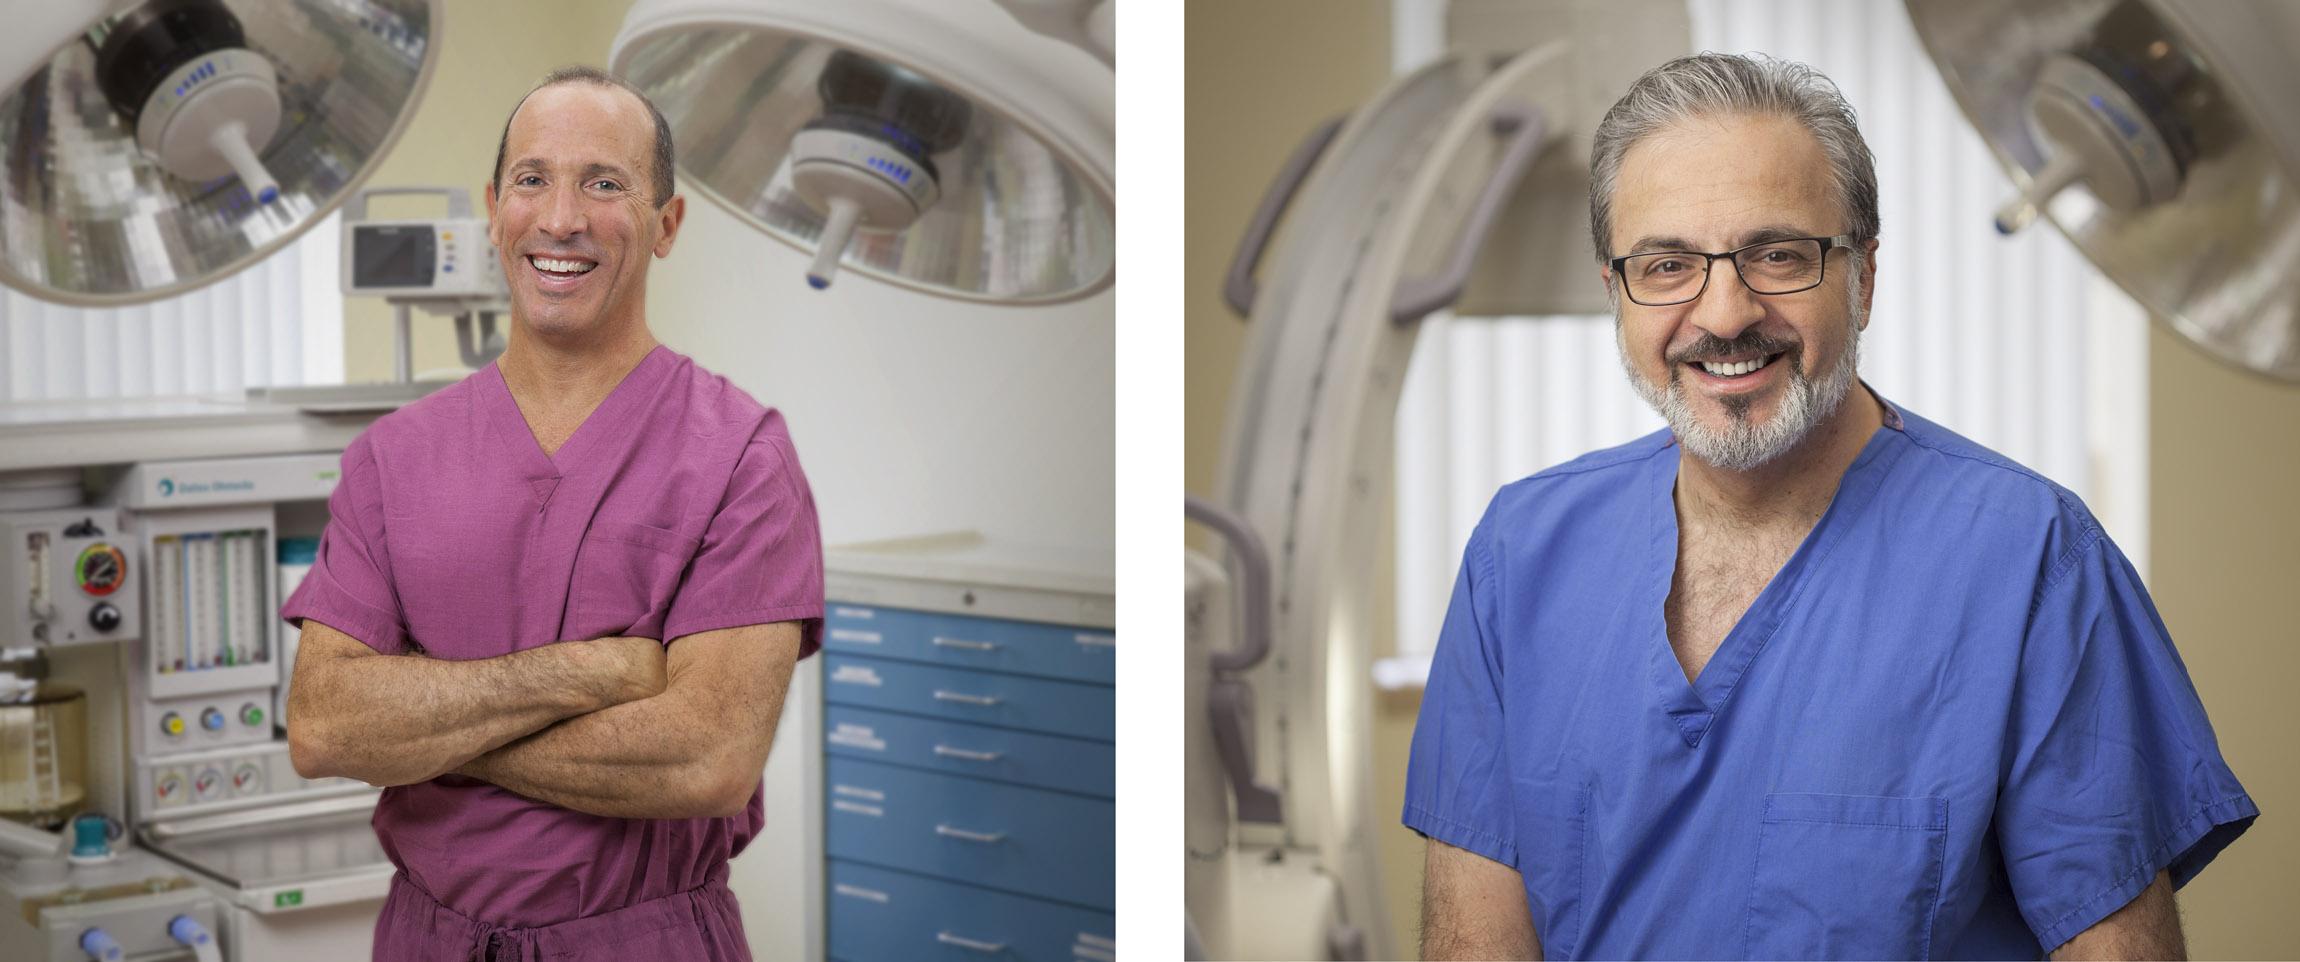 Surgeons at Mid Hudson Regional Hospital